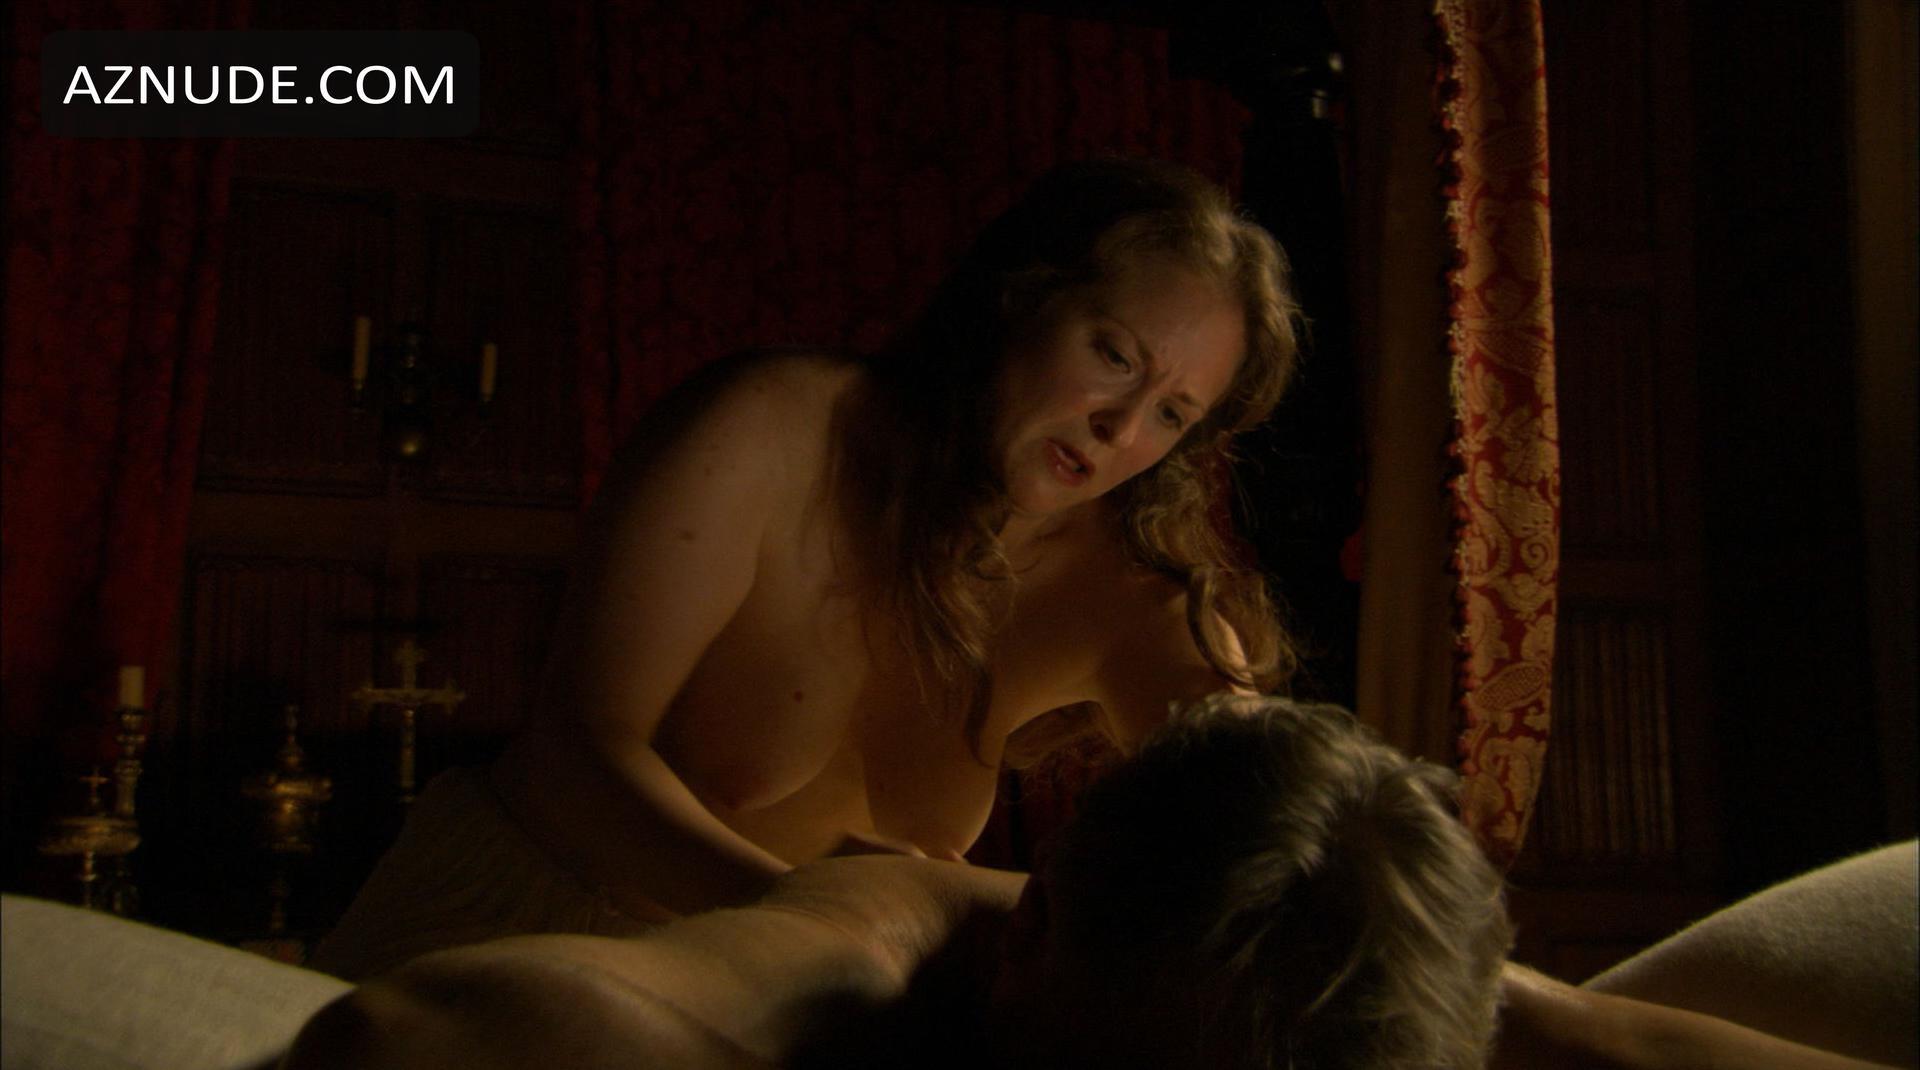 Alexandra Doyle Porn lorna doyle nude - aznude